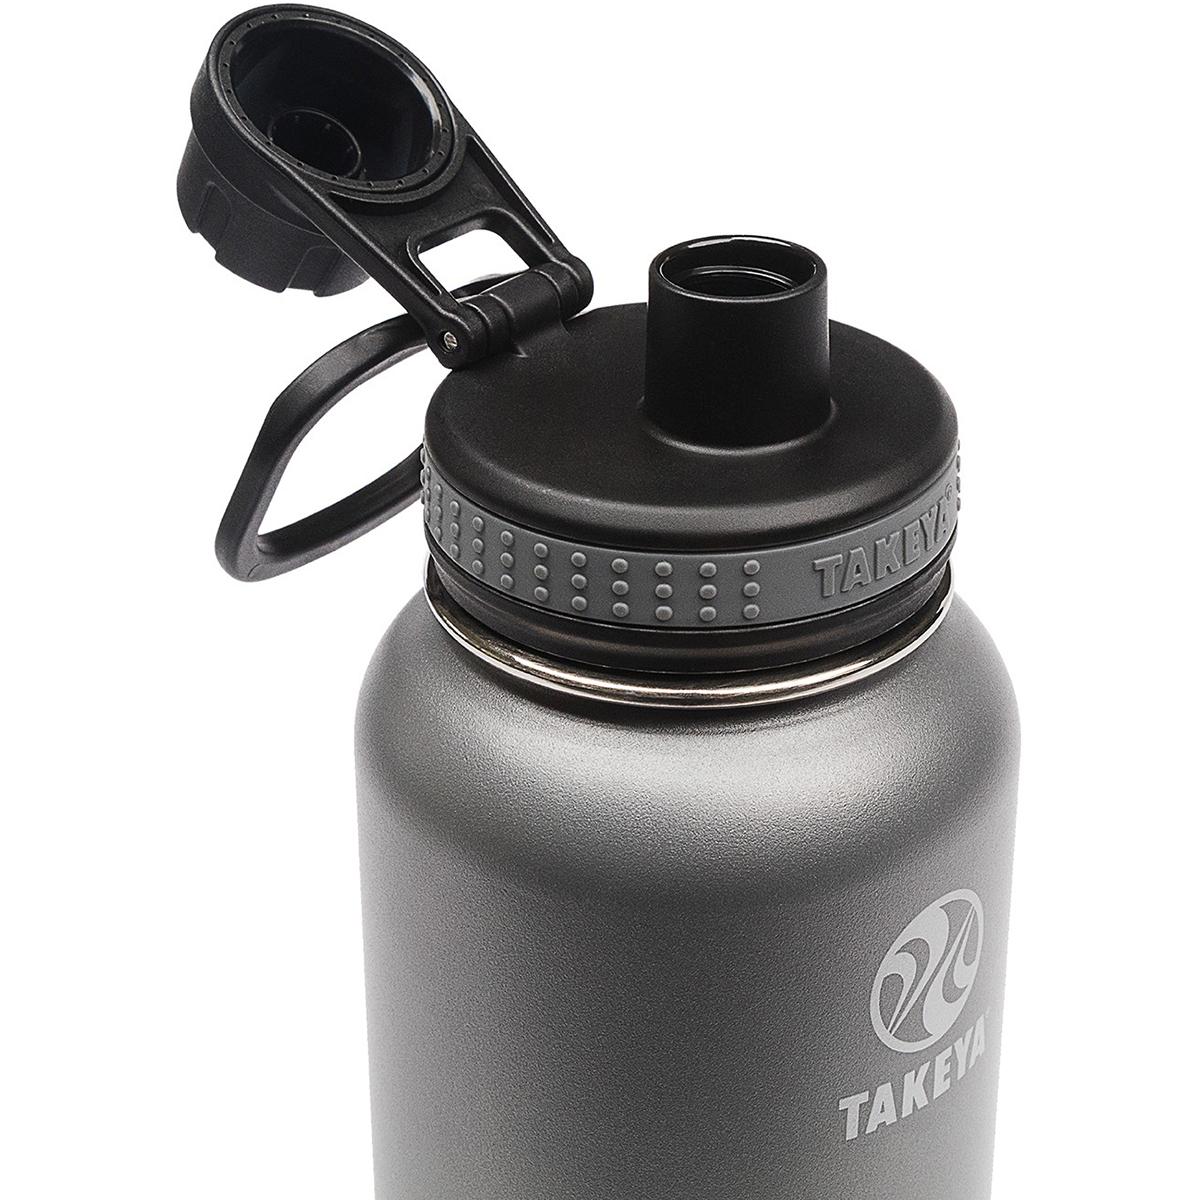 Takeya-Originals-40-oz-Insulated-Stainless-Steel-Water-Bottle thumbnail 6